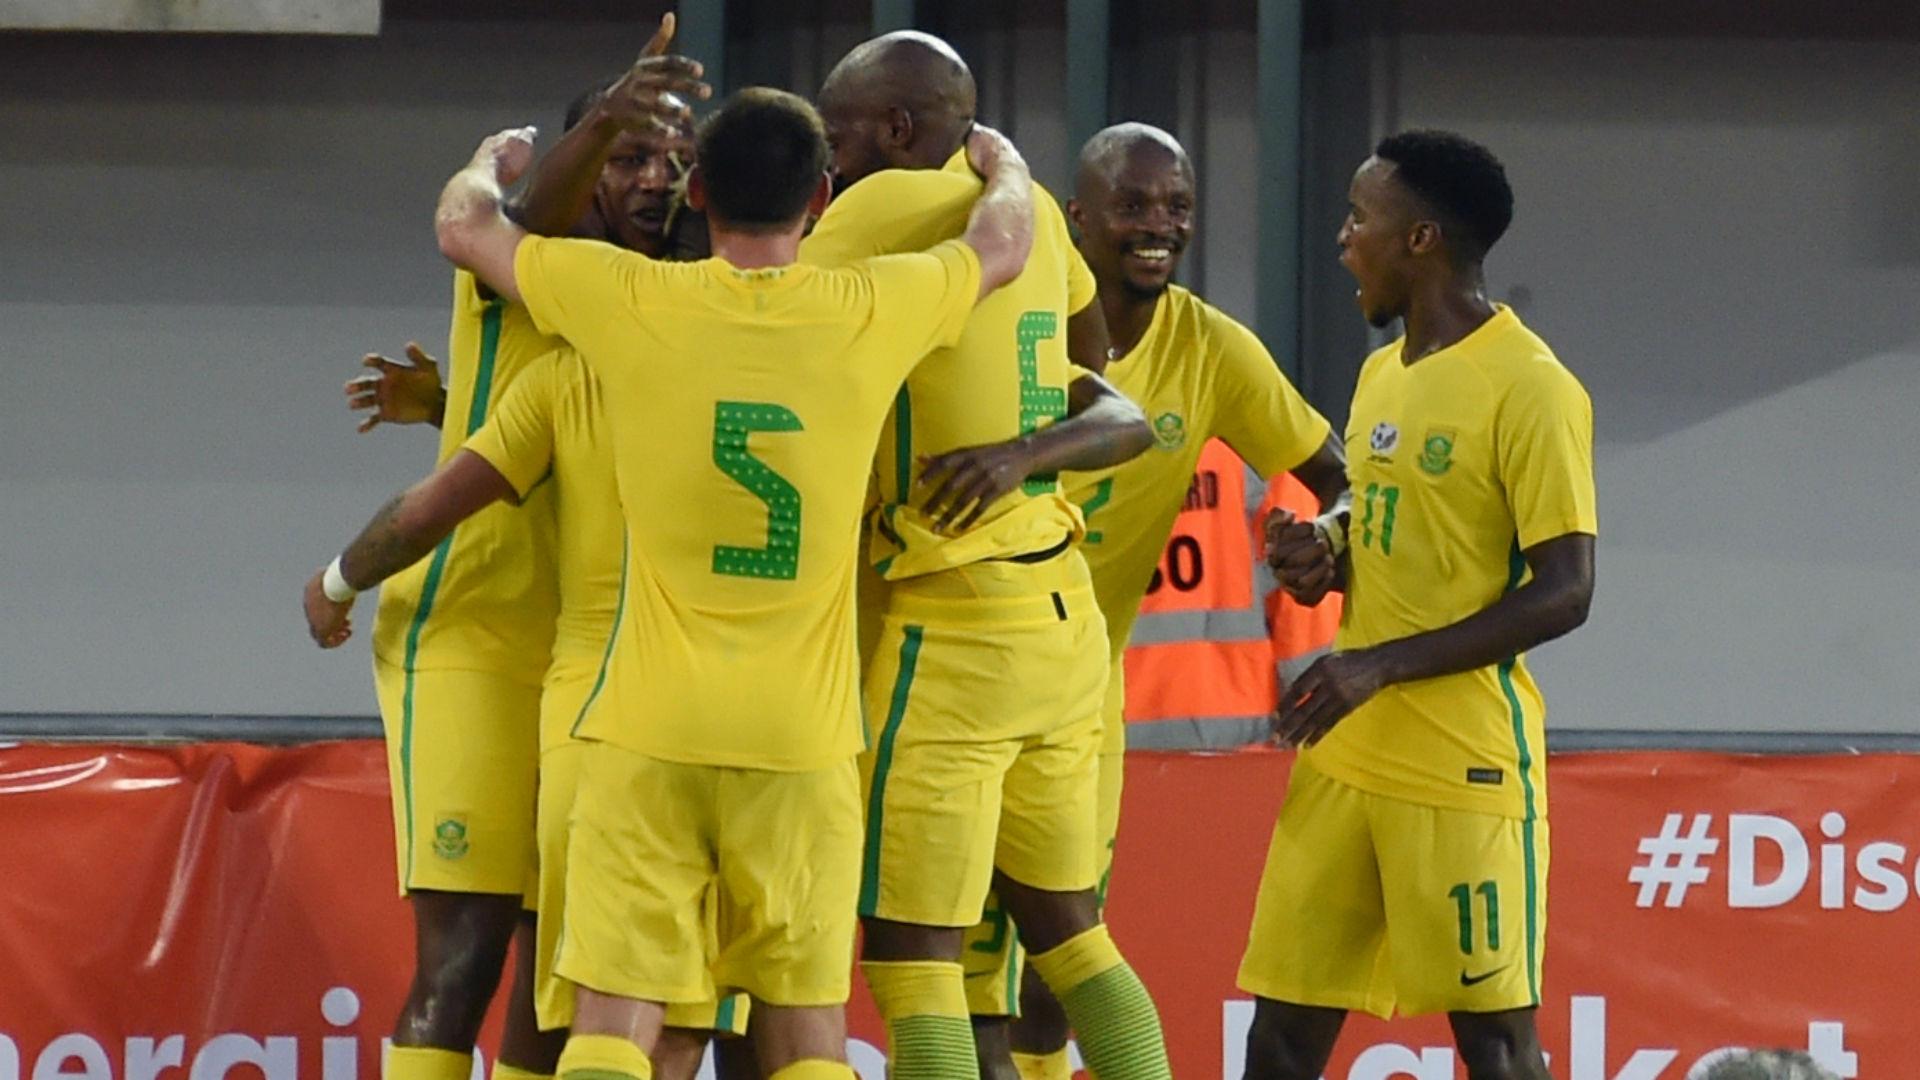 FIFA RANKINGS: Nigeria drop 6 places despite big win against Cameroon